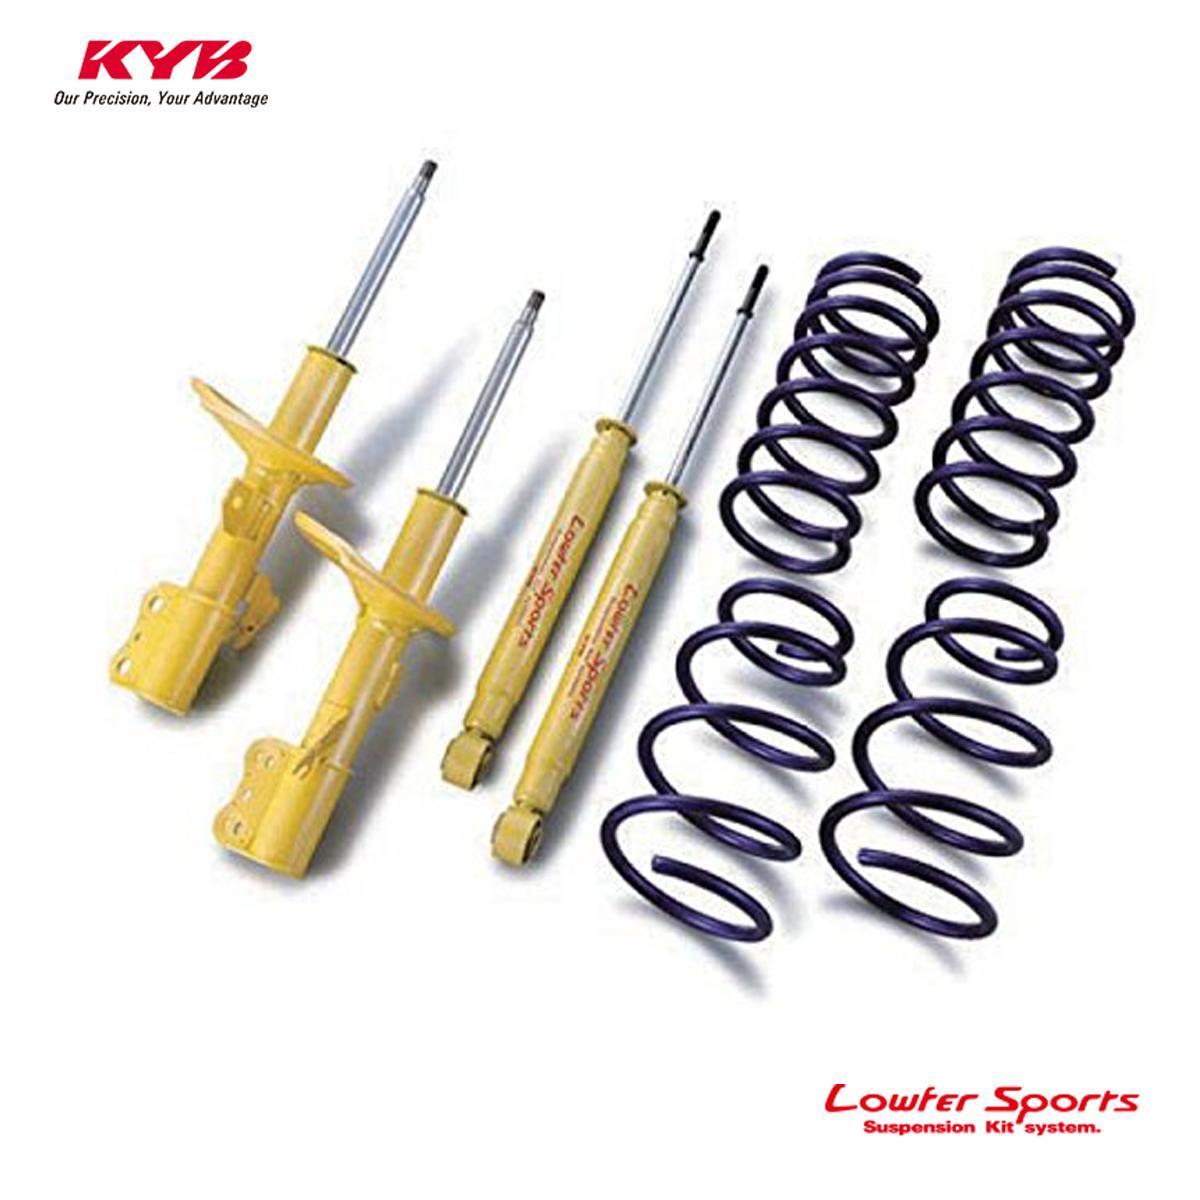 KYB カヤバ プリウスα ZVW40W ショックアブソーバー サスペンションキット 1台分 ローファースポーツ キット Lowfer Sports LKIT-ZVW41W